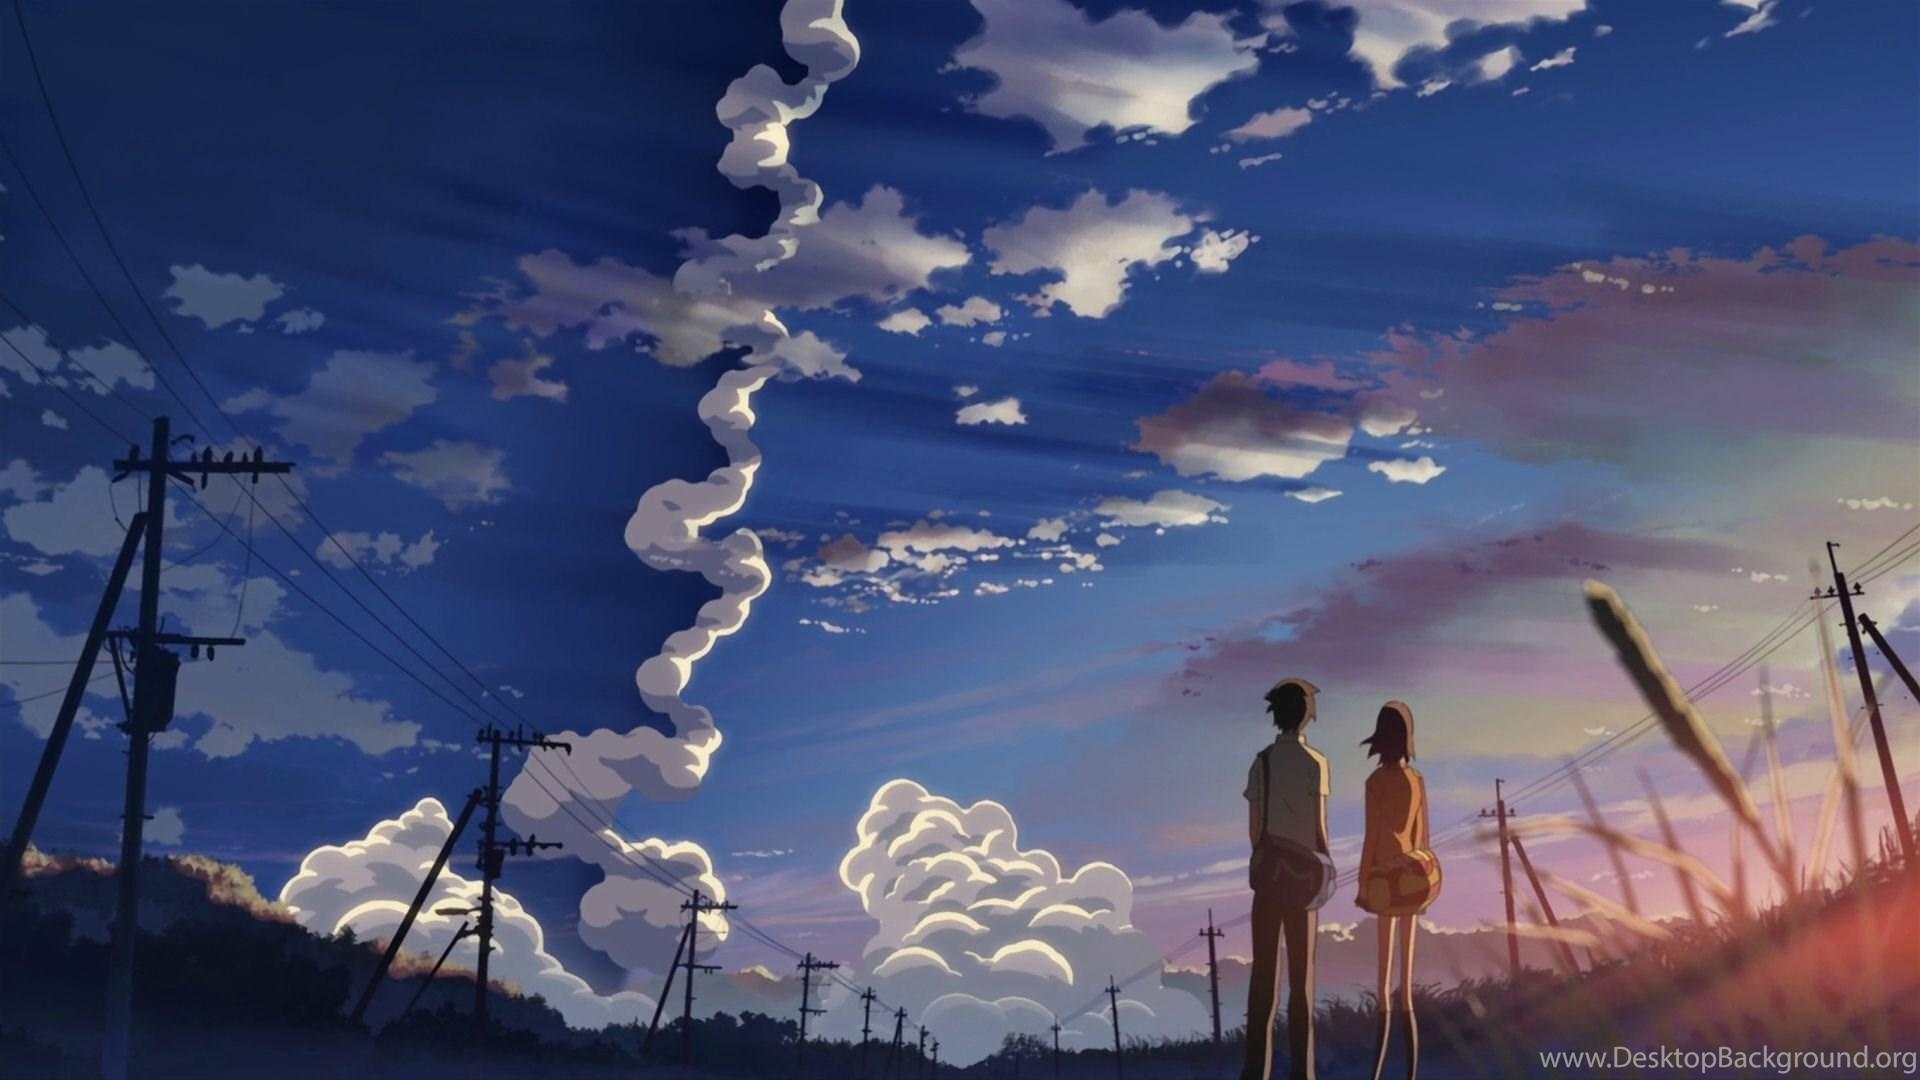 Anime Manga Hd Wallpapers Page 424 Desktop Background